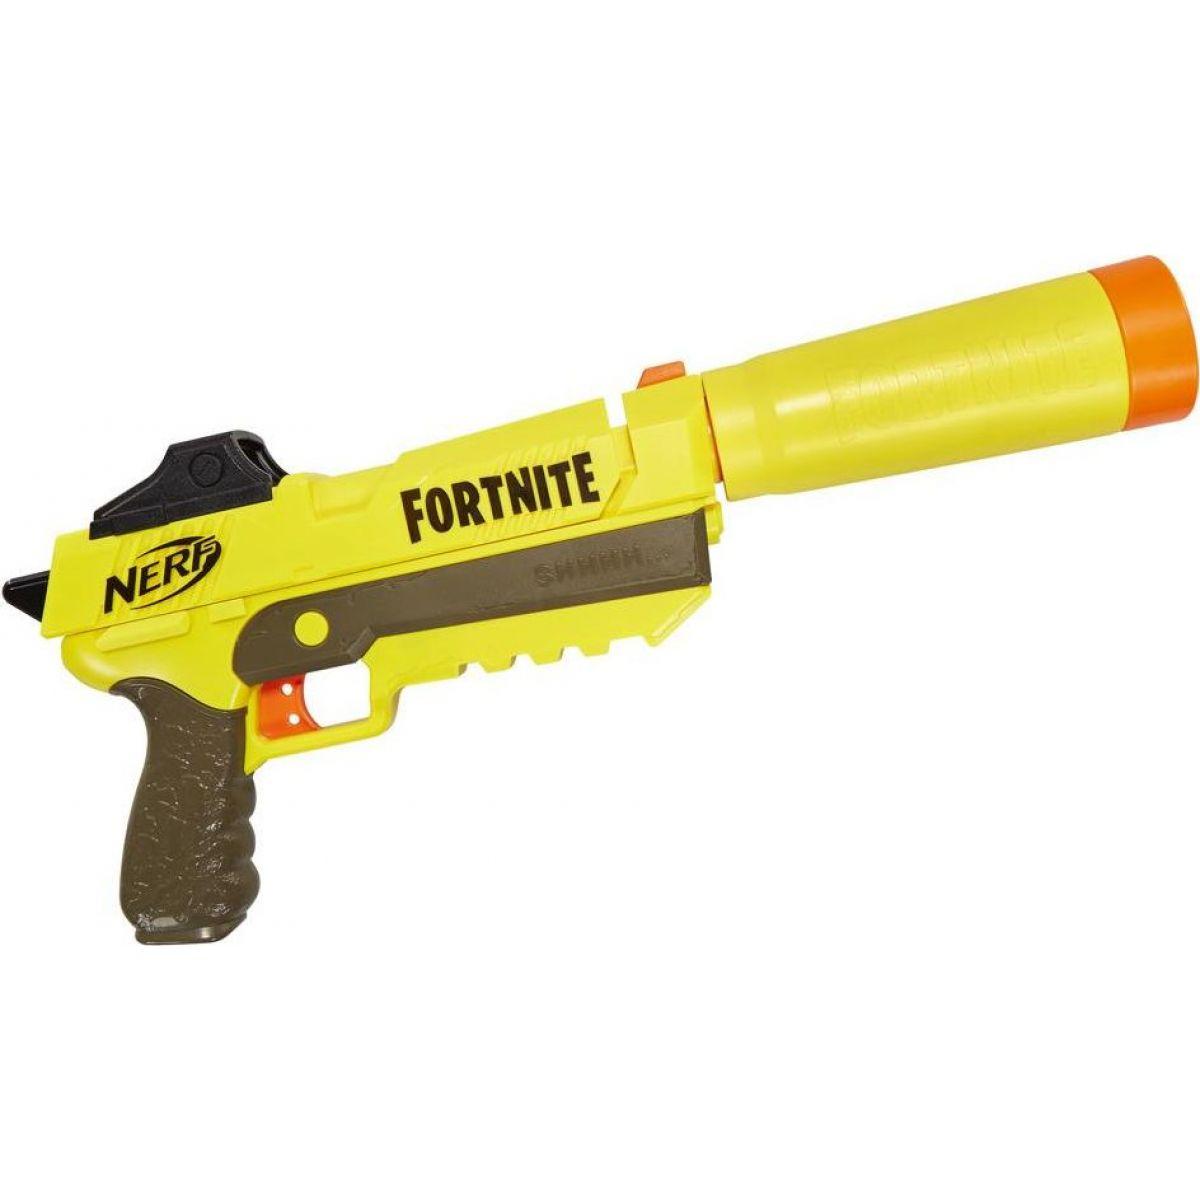 Hasbro Nerf Fortnite Sneaky Springer